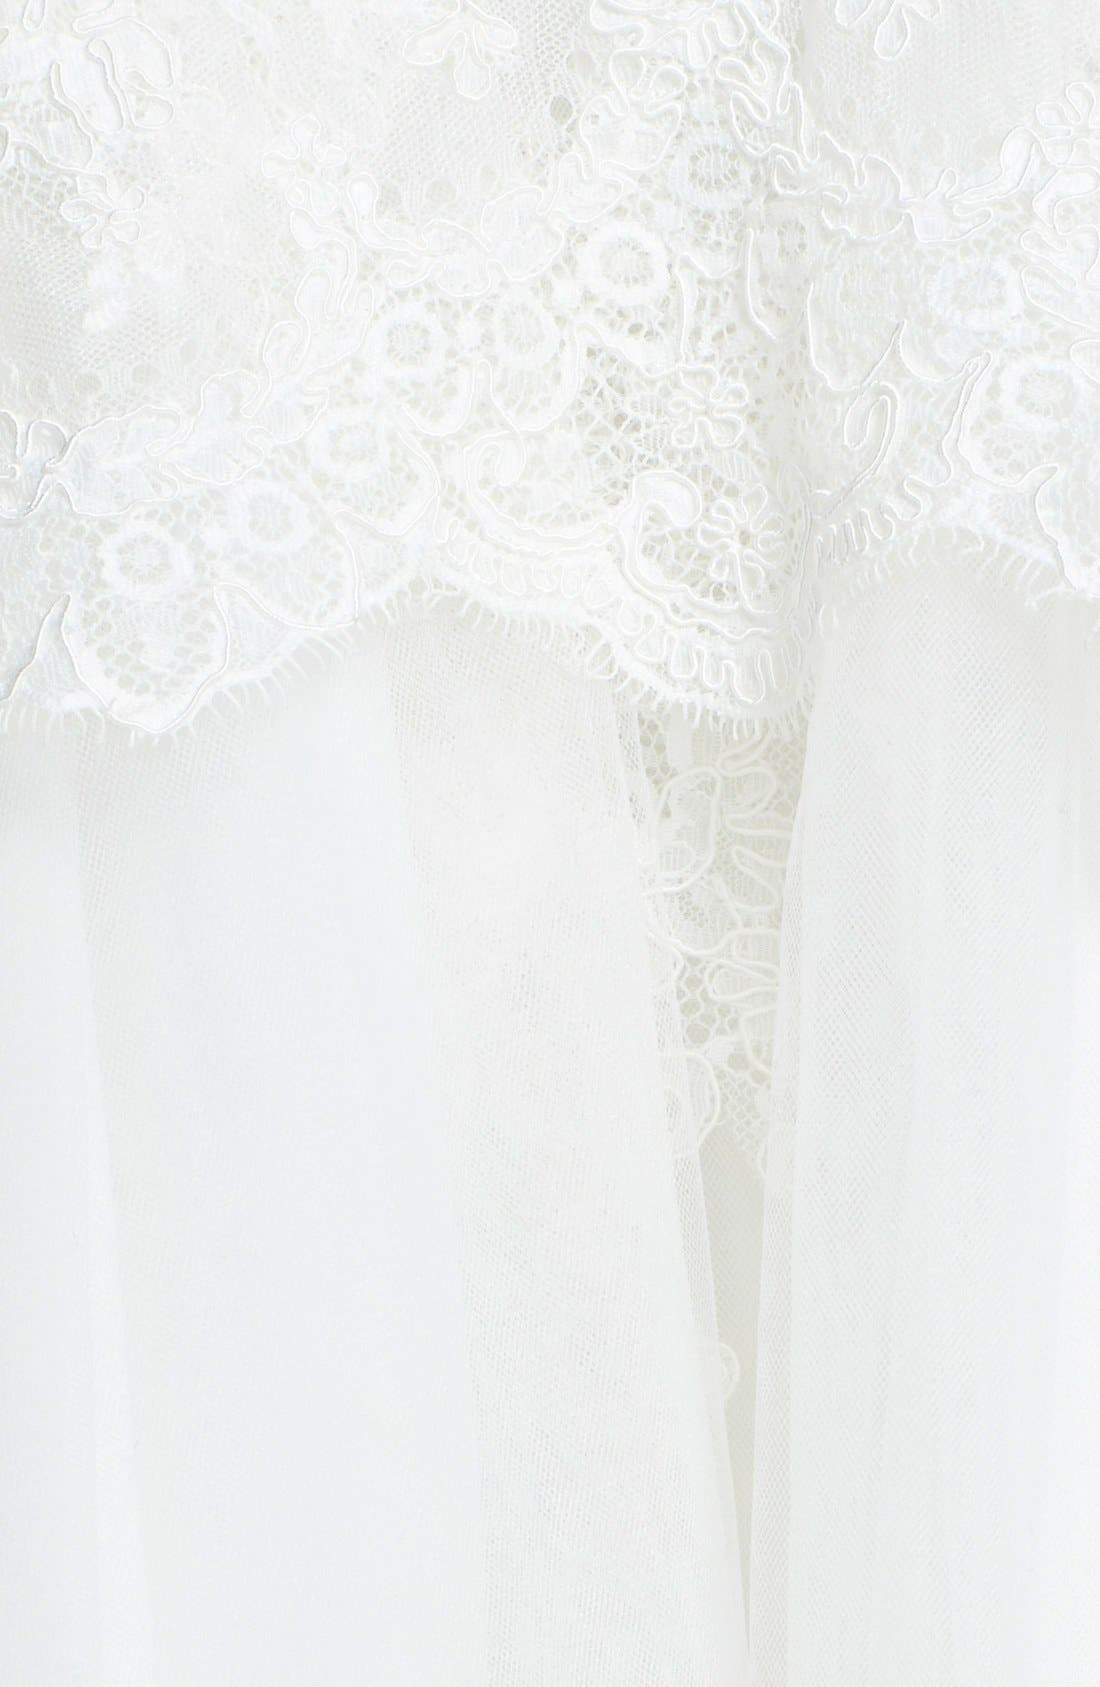 Alternate Image 3  - BLISS Monique Lhuillier Lace Overlay Tulle Trumpet Wedding Dress